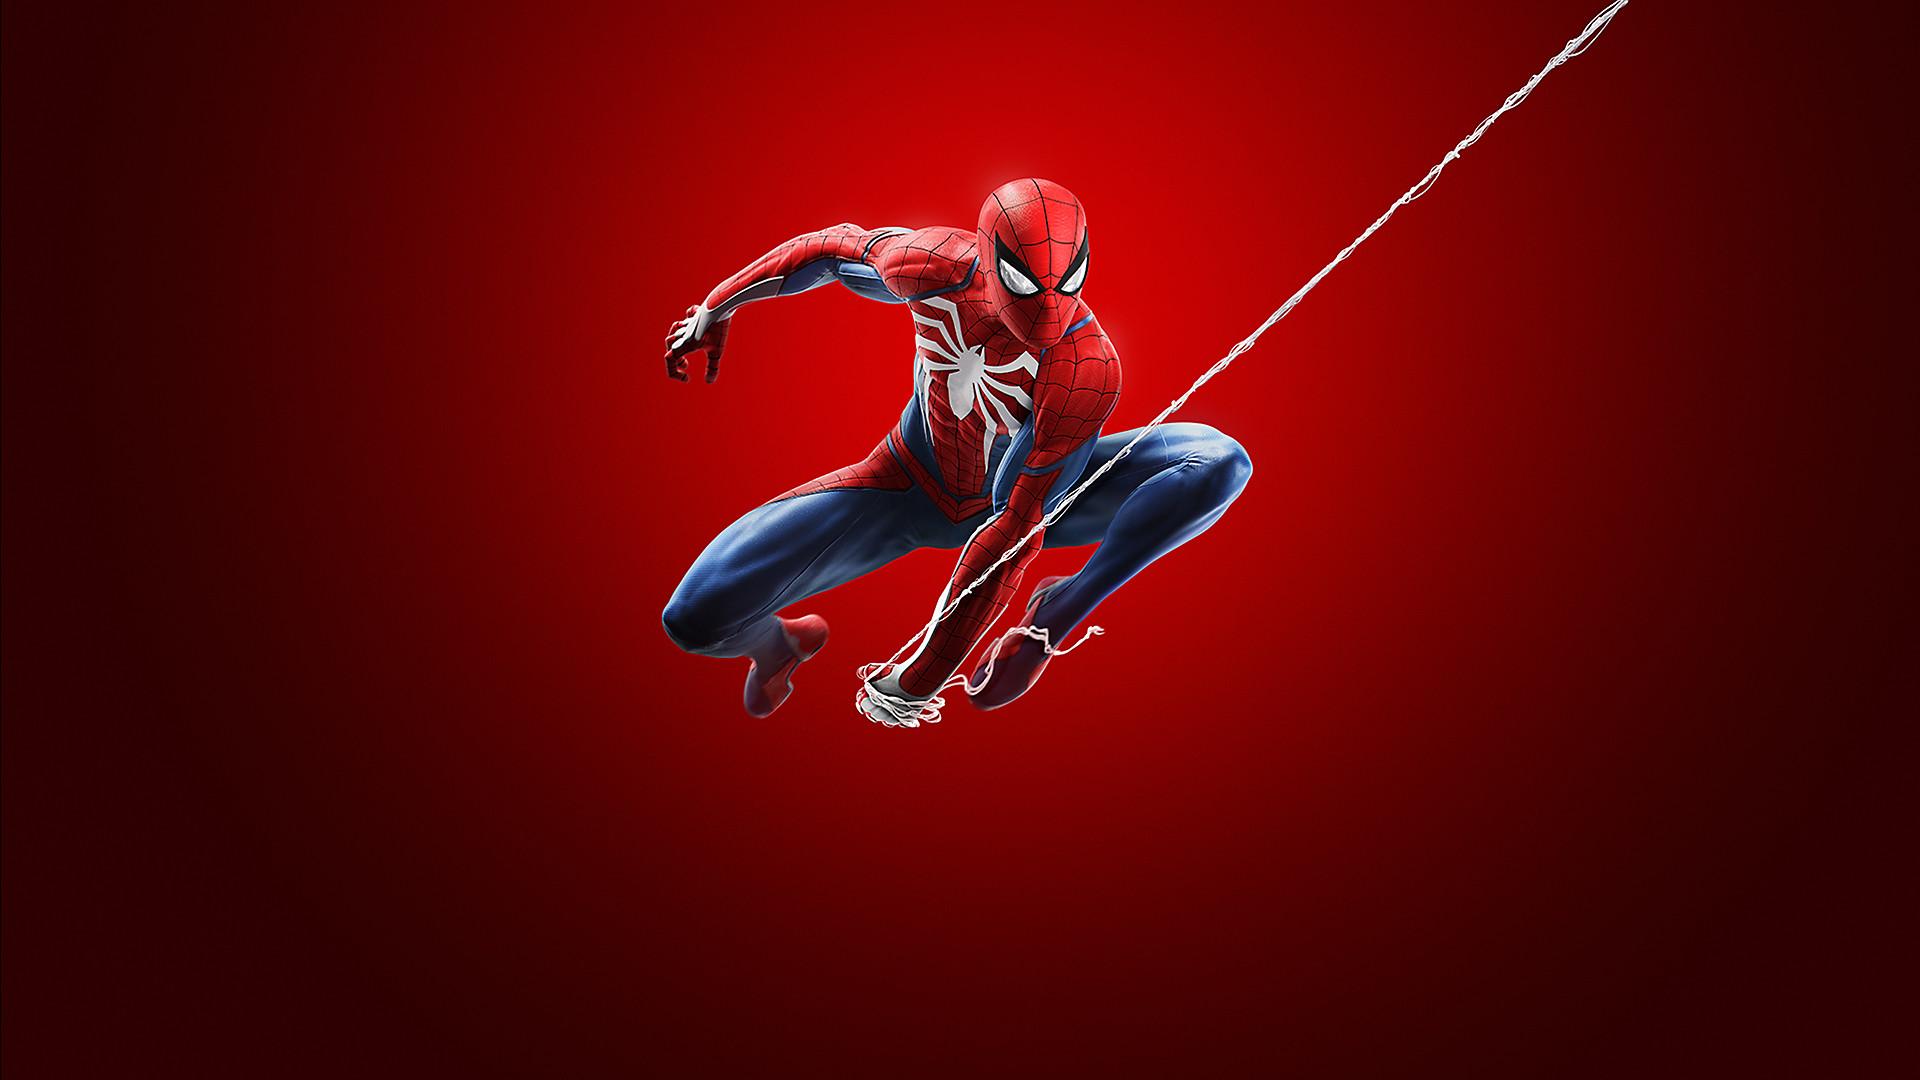 Marvel's Spider-Man cover